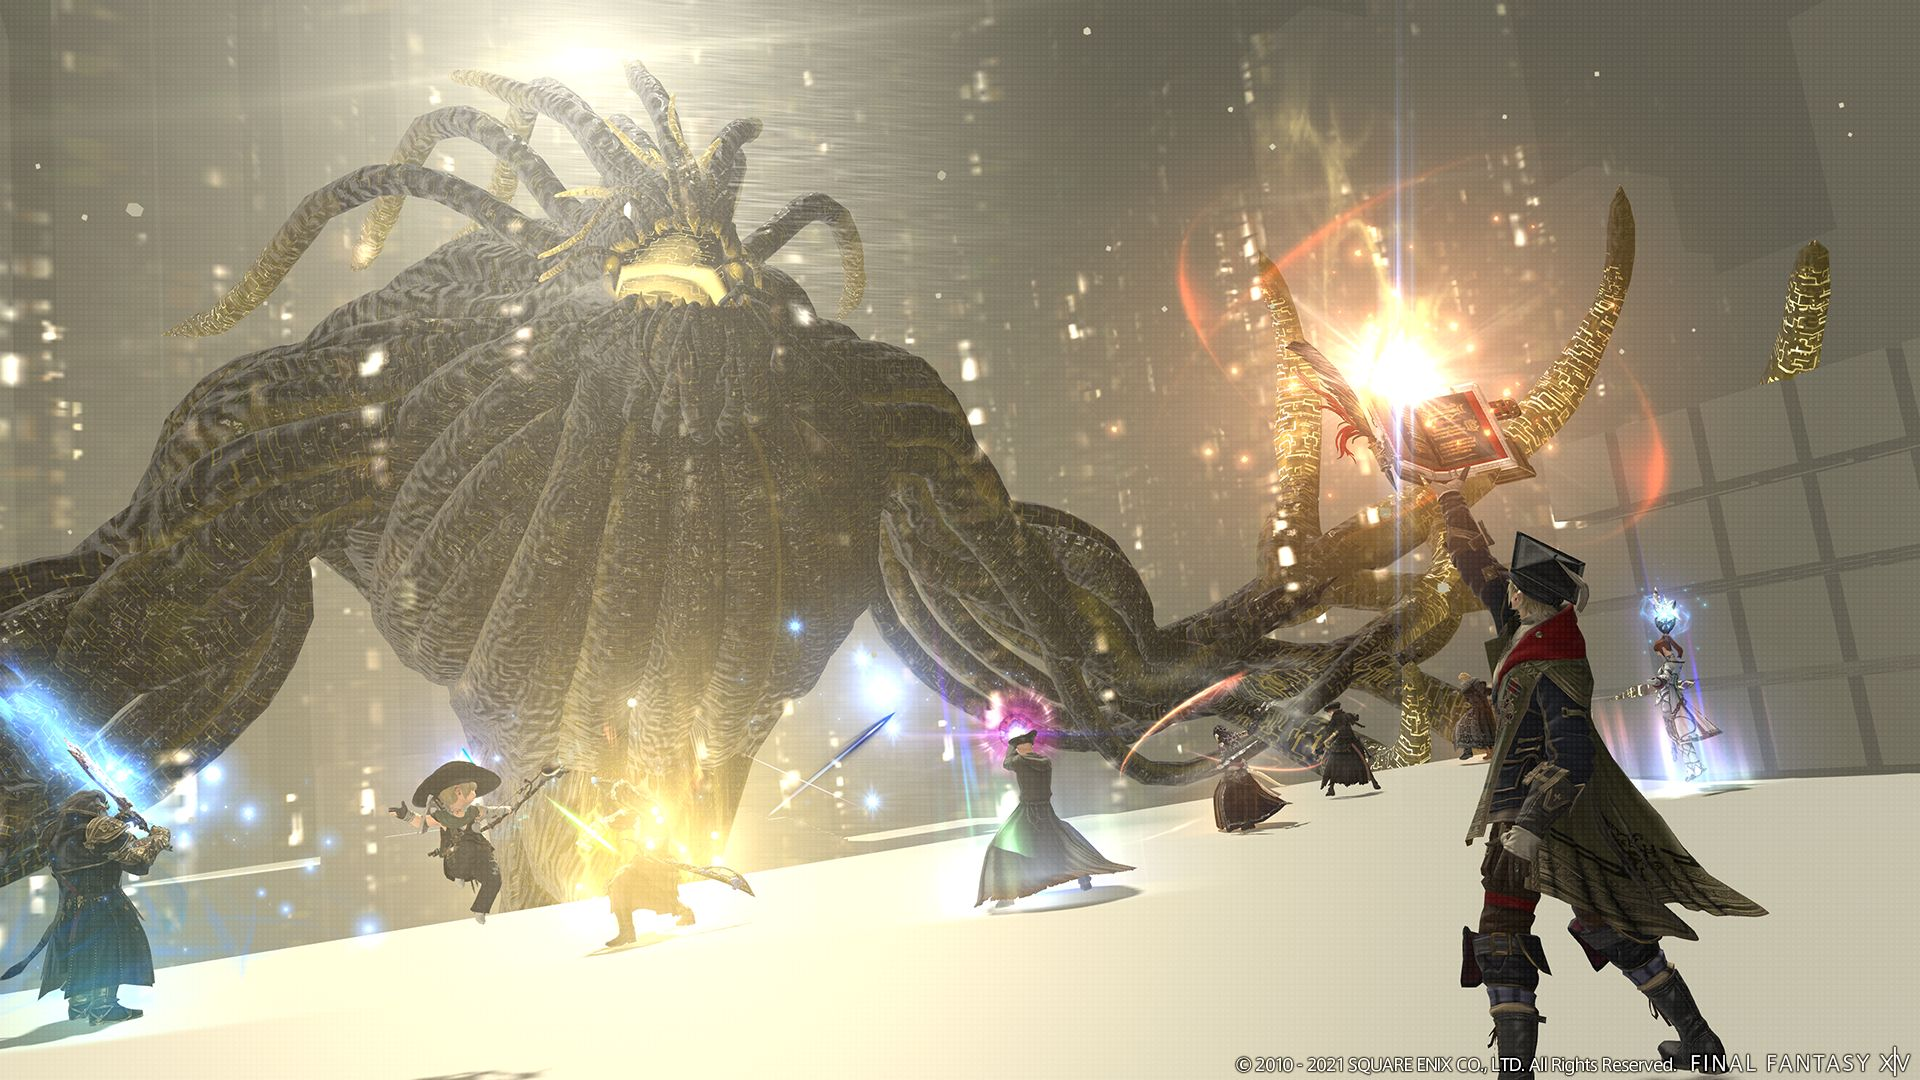 Final Fantasy 14 Crosses 22 Million Registered Users